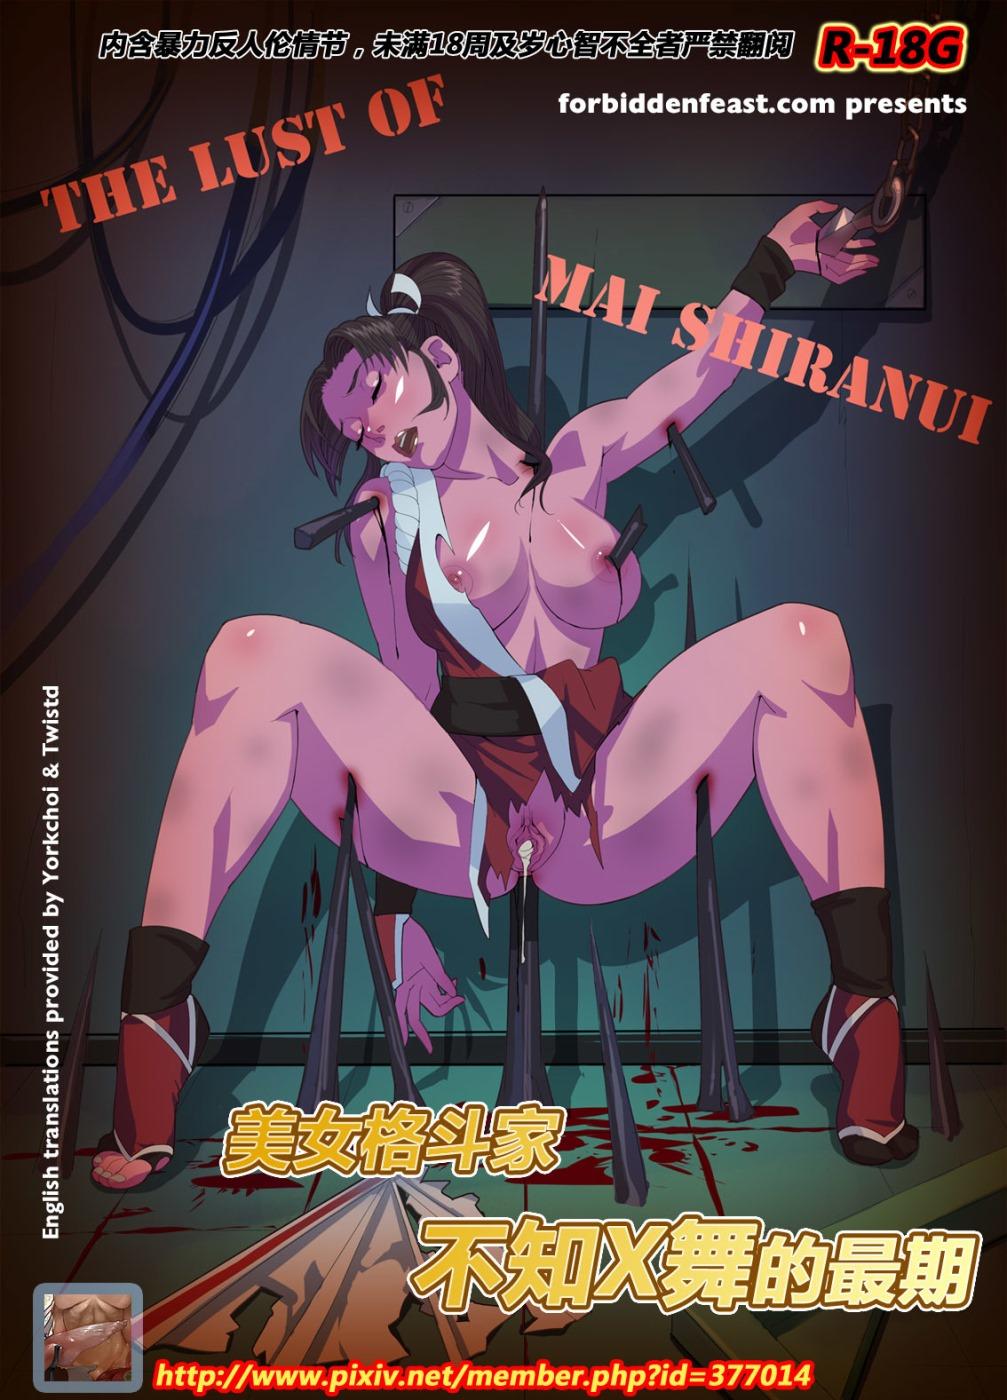 King of Fighters- Lust of Mai Shiranui image 1